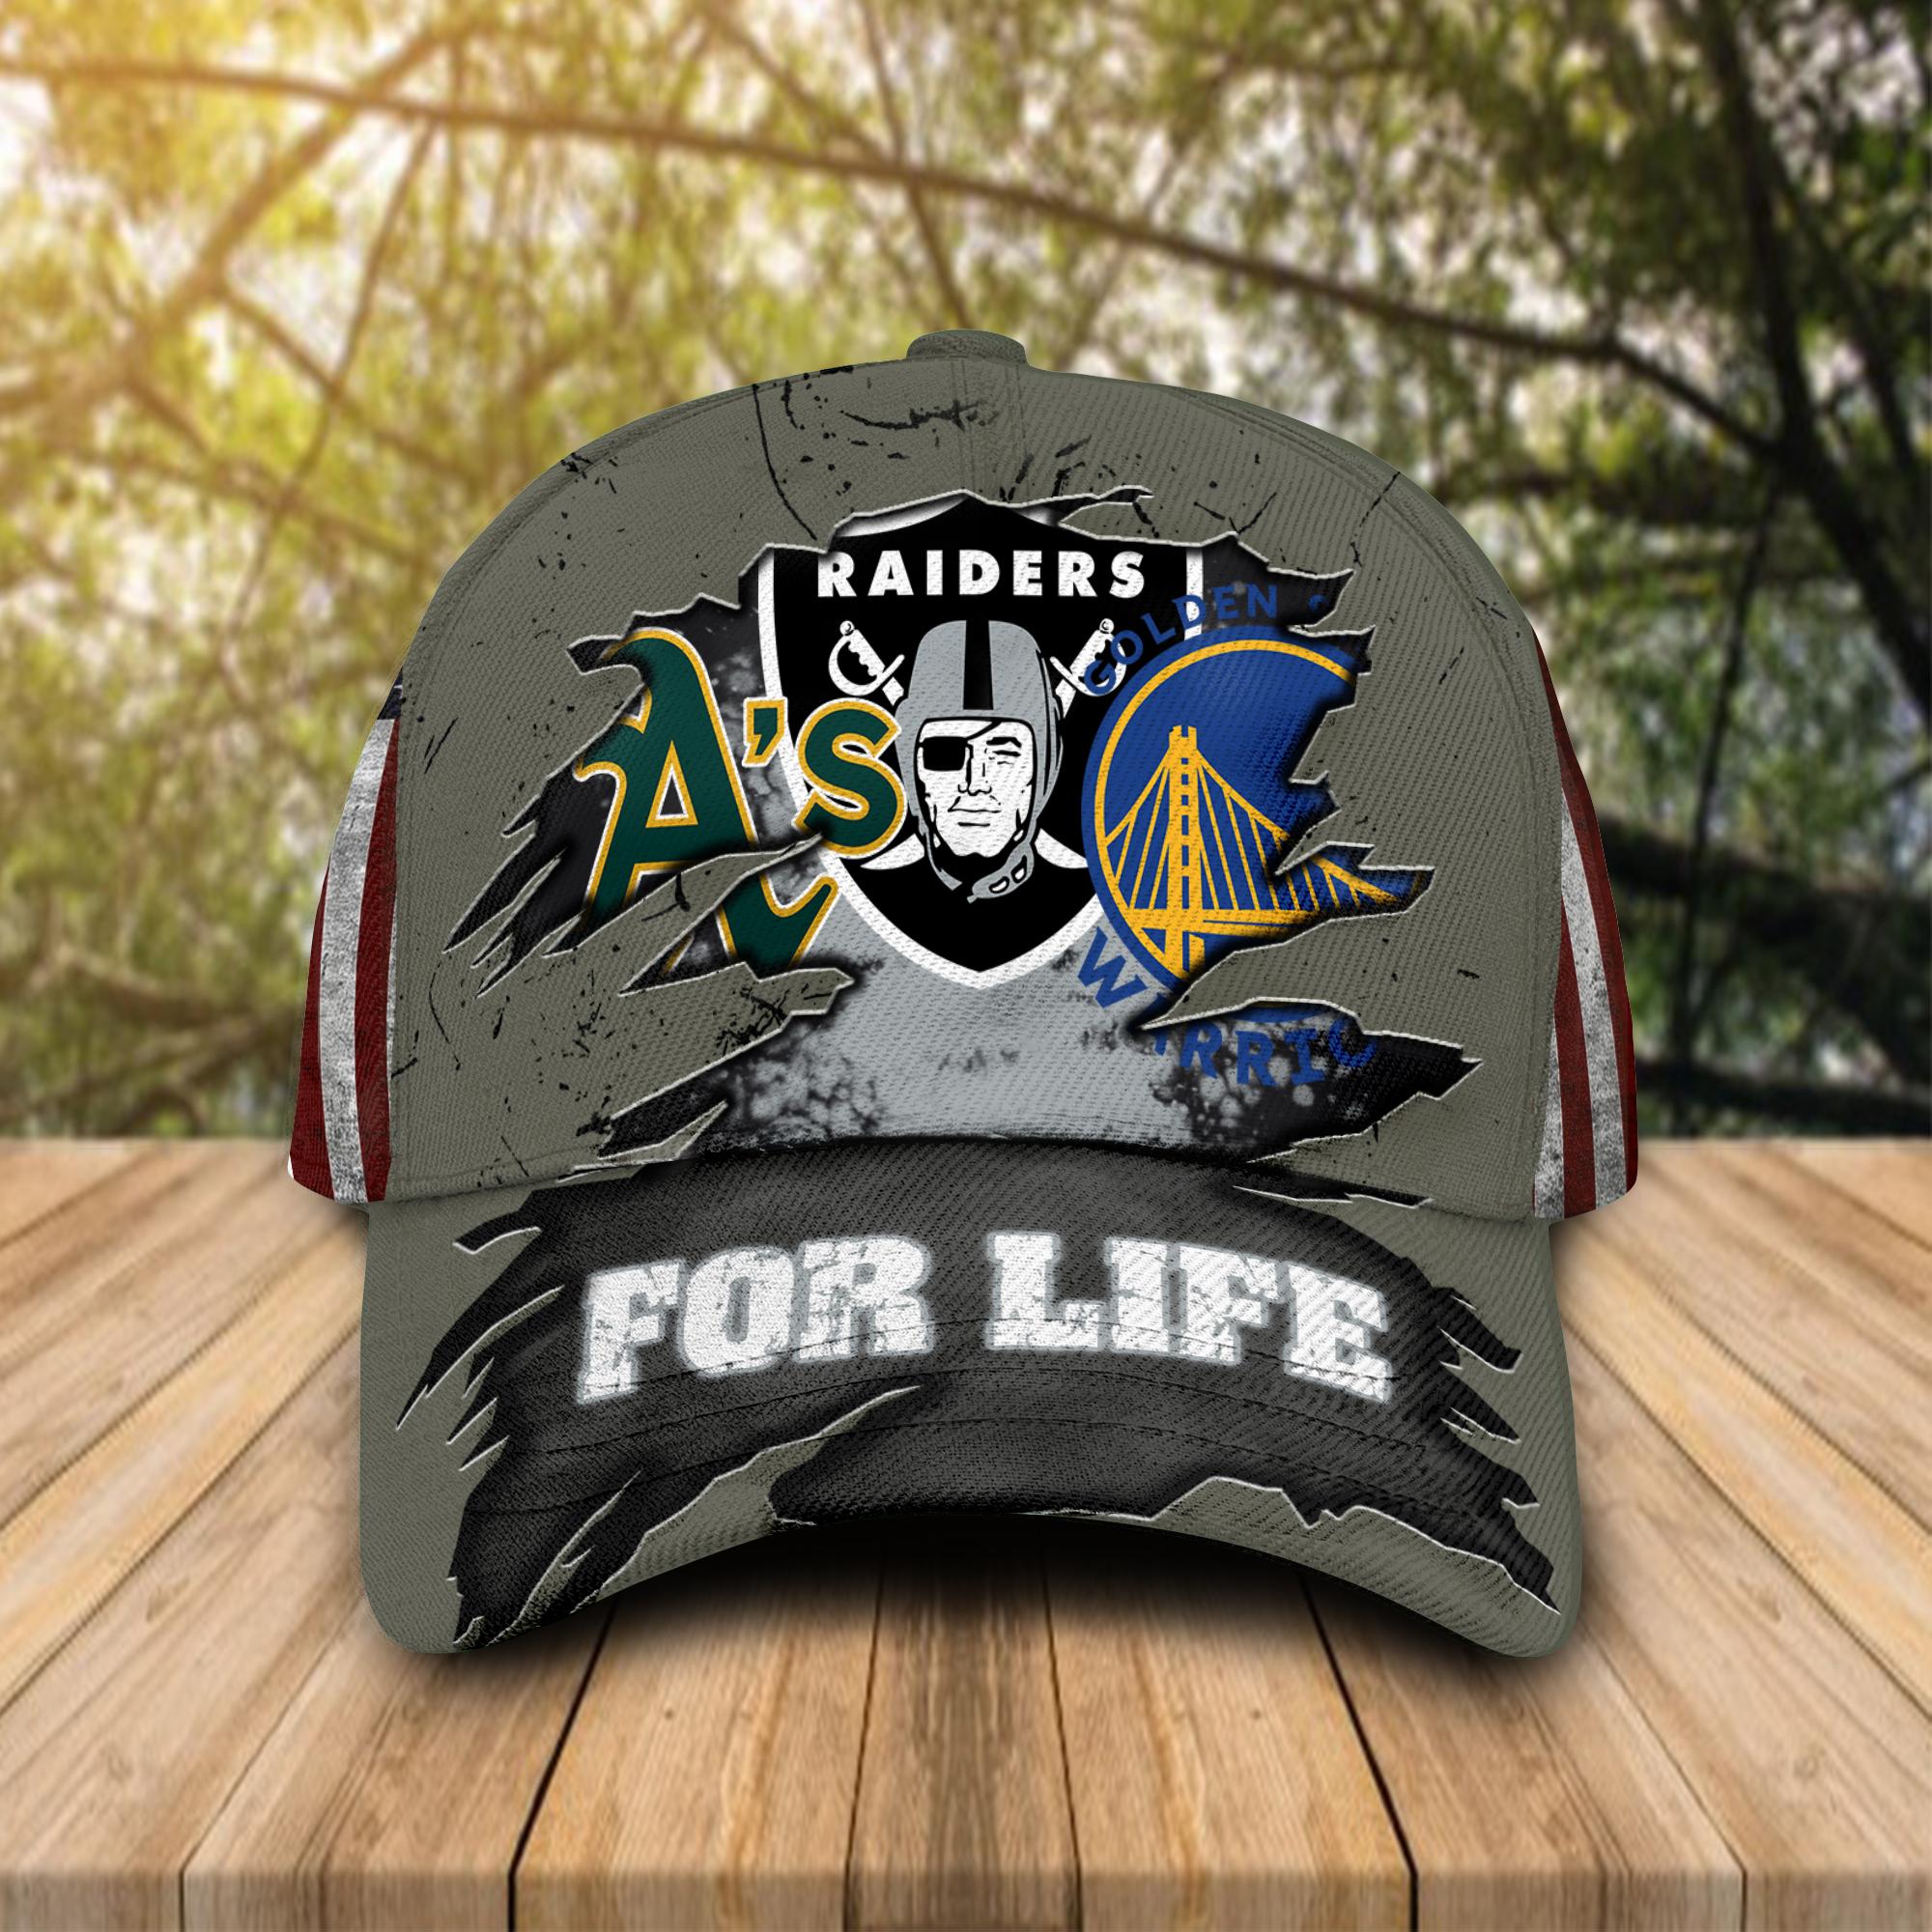 Oakland Athletics Oakland Raiders Golden State Warriors For Life Hat Cap